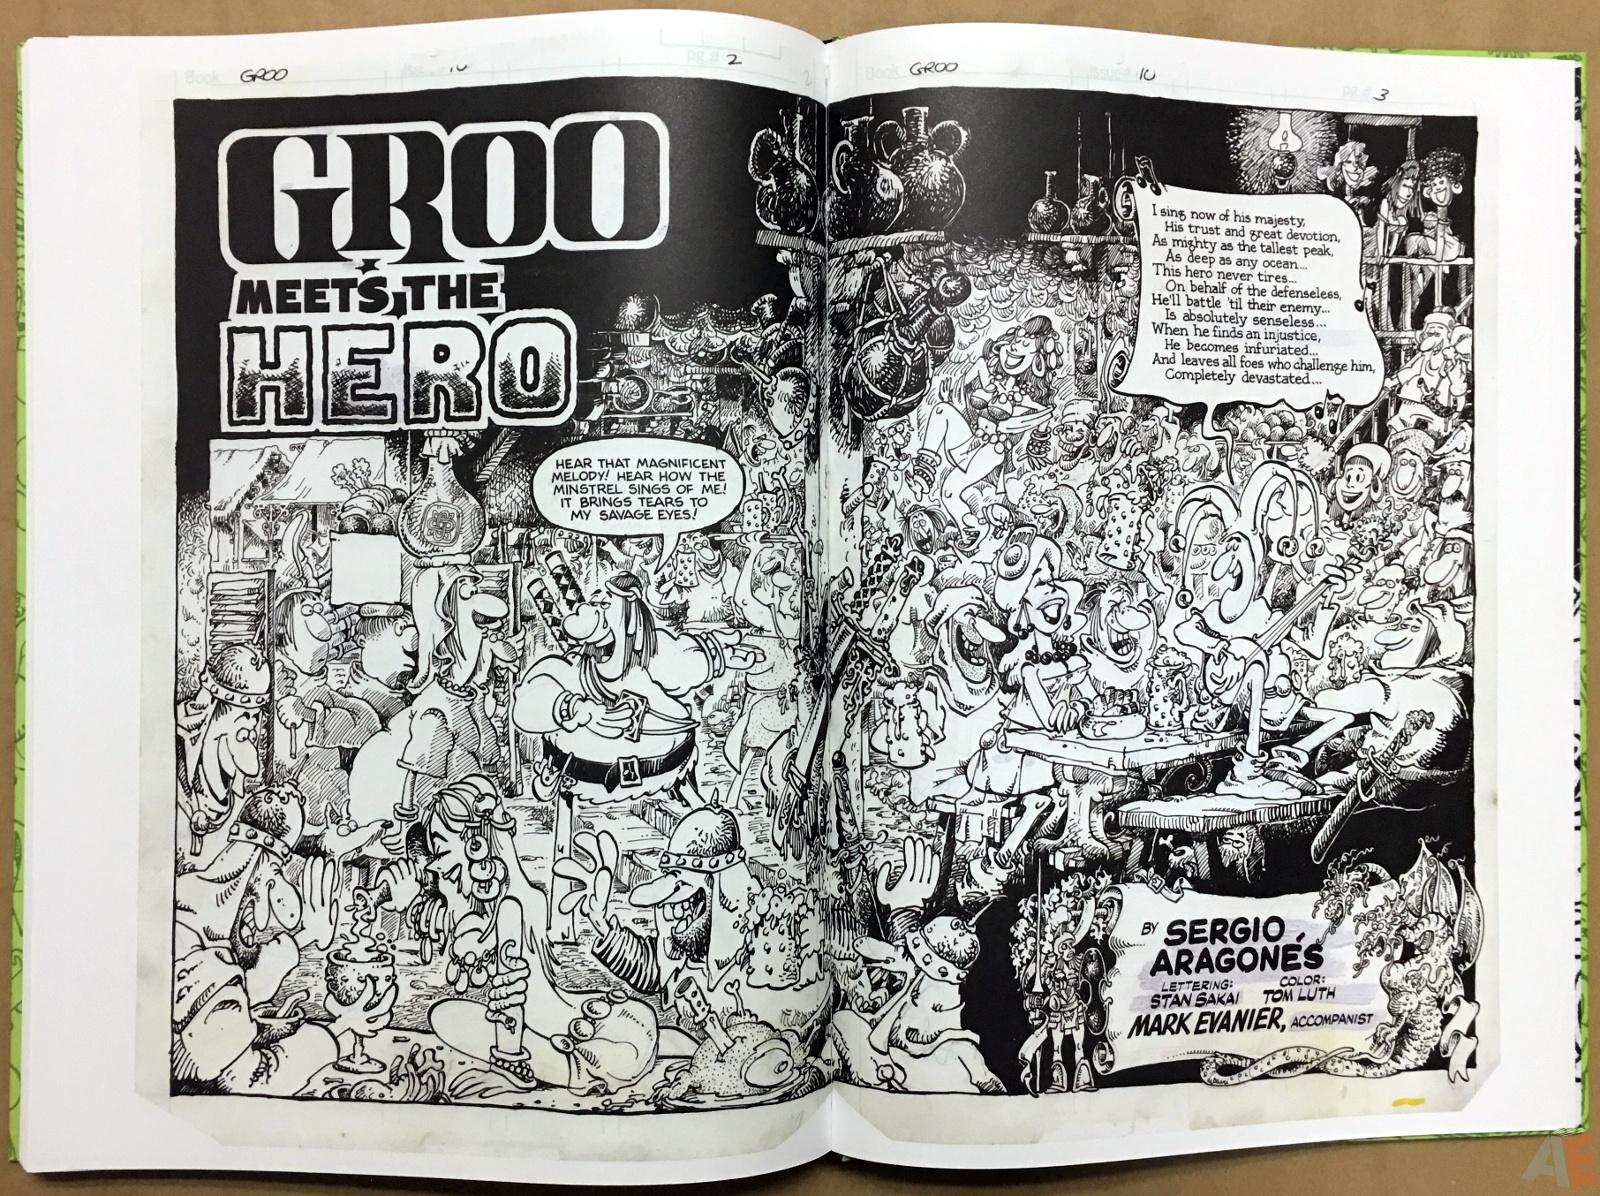 Sergio Aragonés Groo The Wanderer Artist's Edition 50